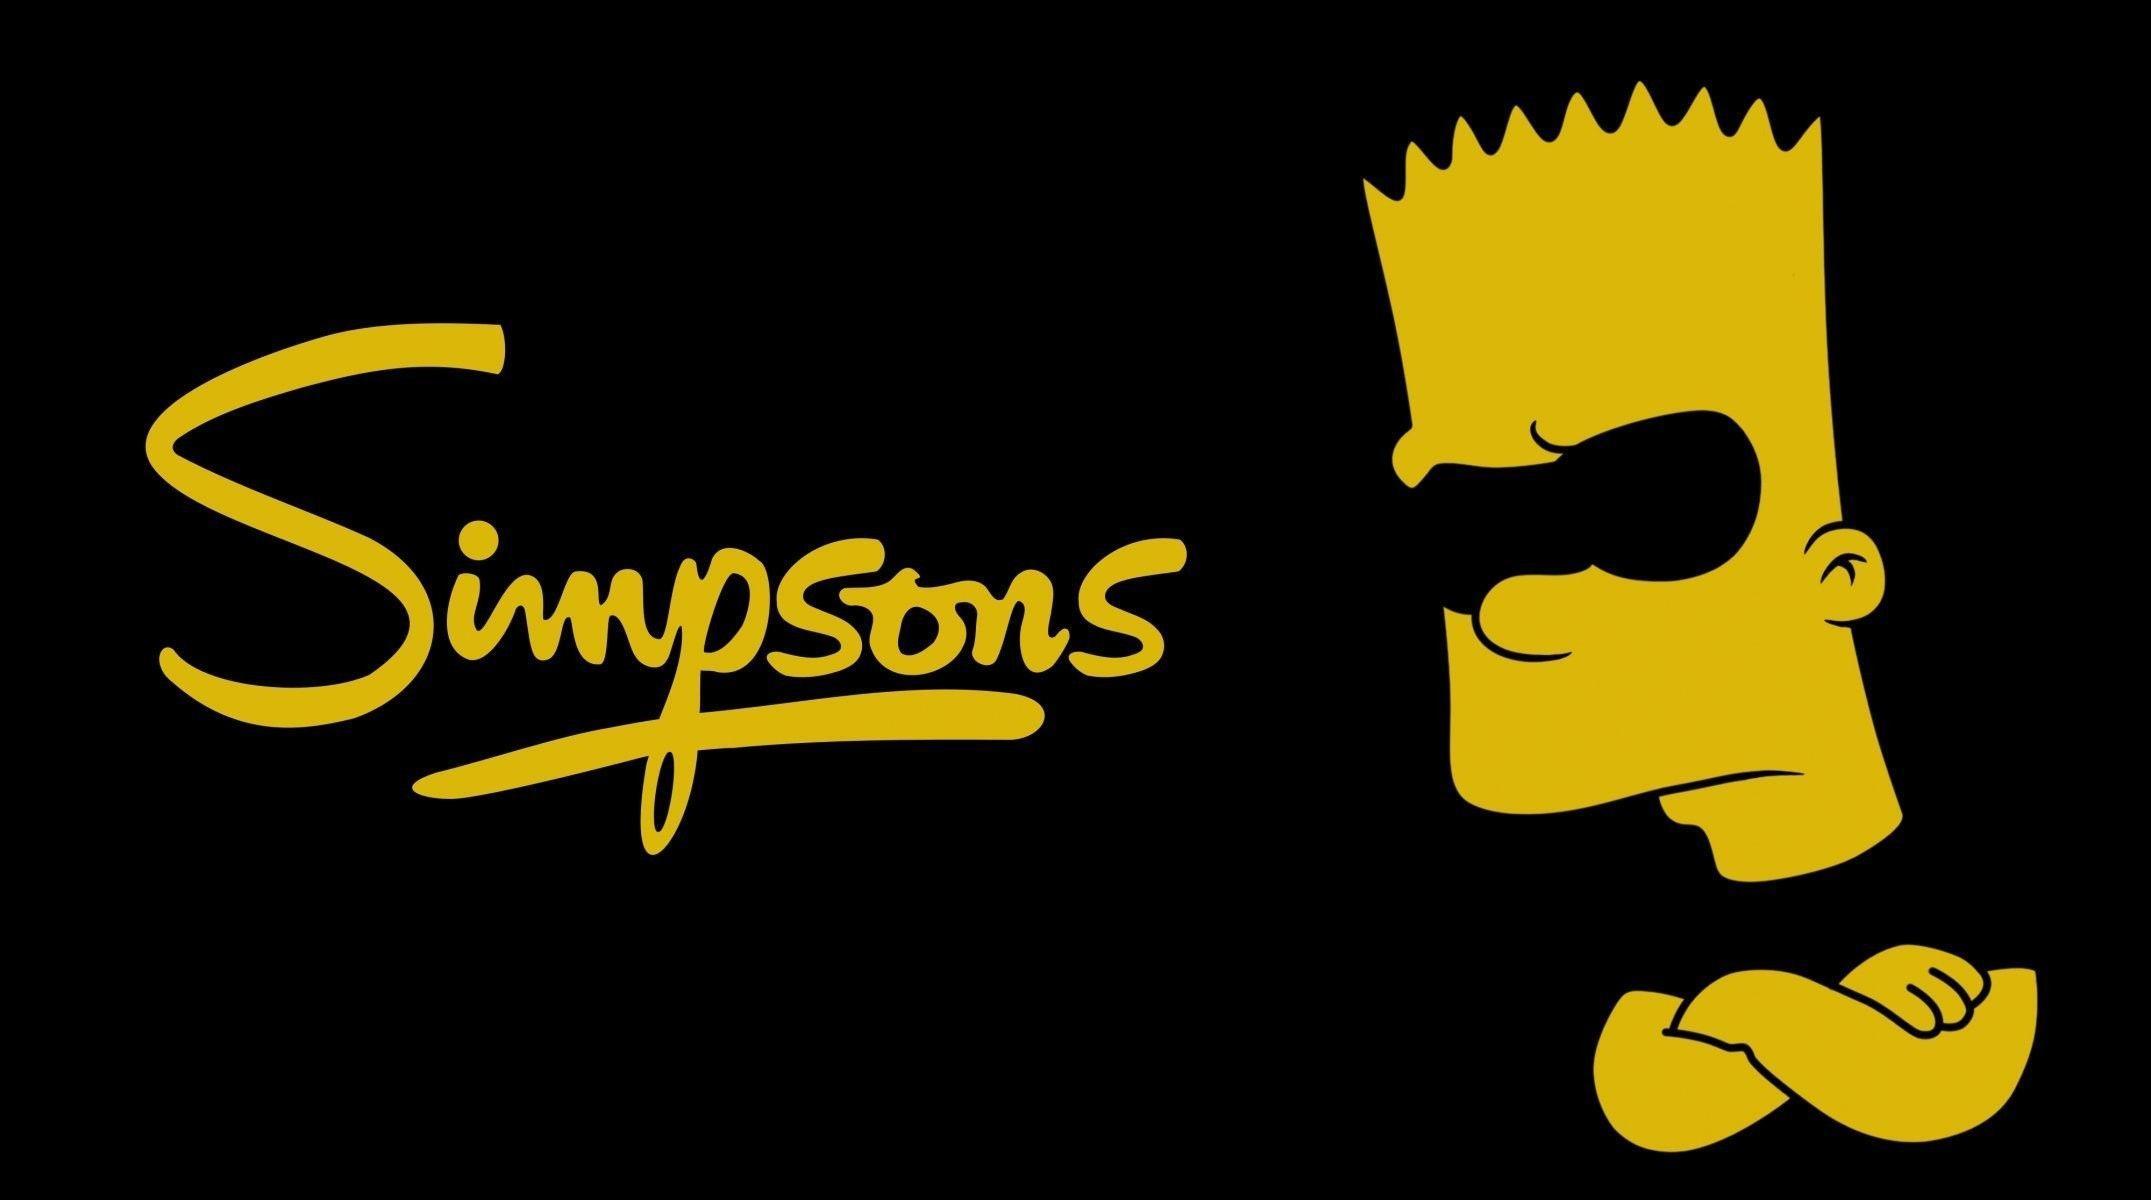 Sad Bart Simpson Wallpapers - Wallpaper Cave